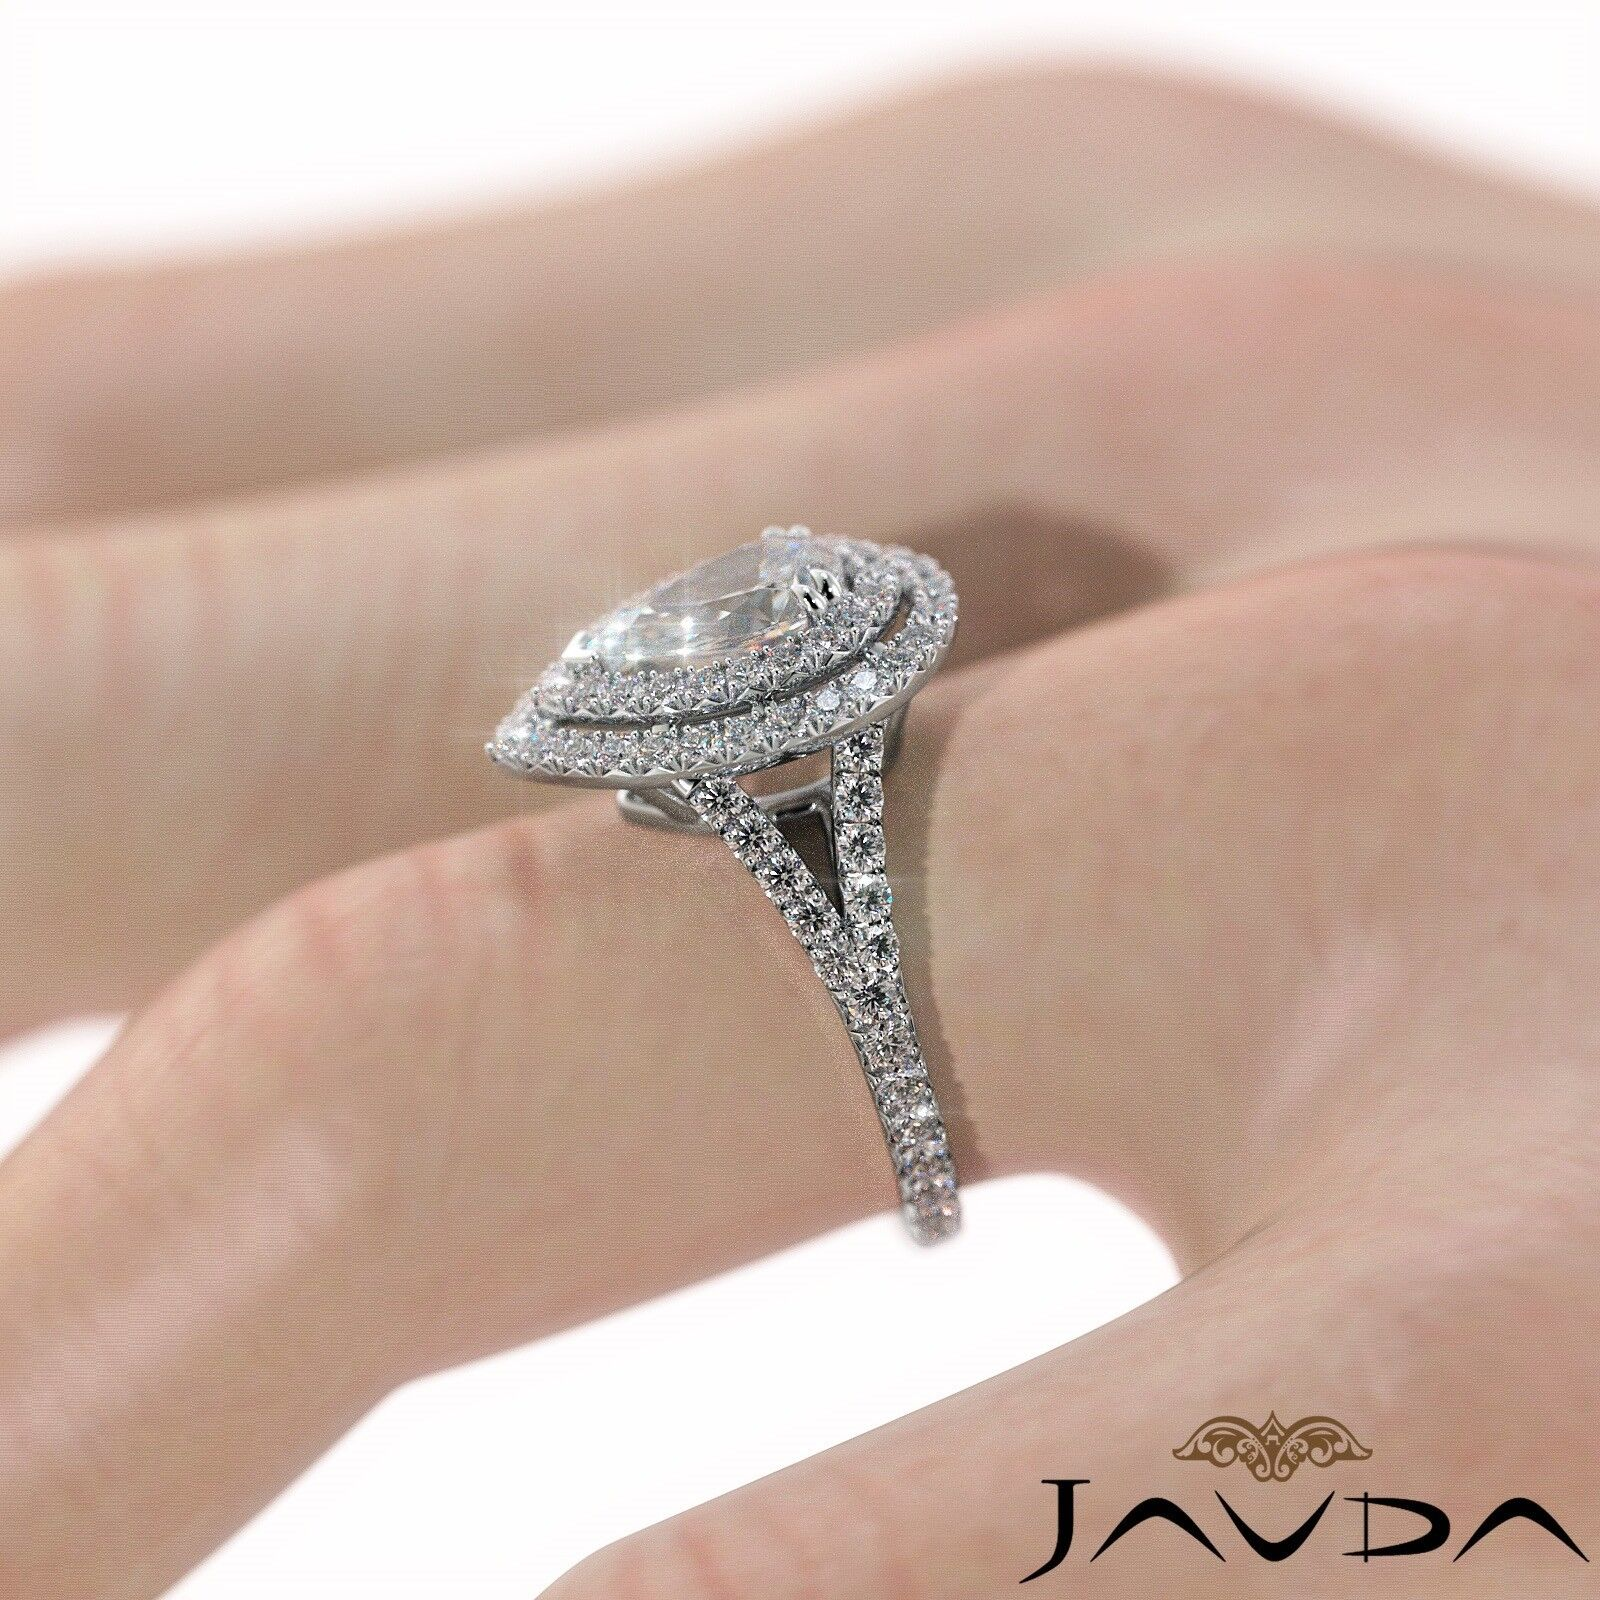 2.12ct Double Halo Split Shank Pear Diamond Engagement Ring GIA E-SI1 White Gold 5